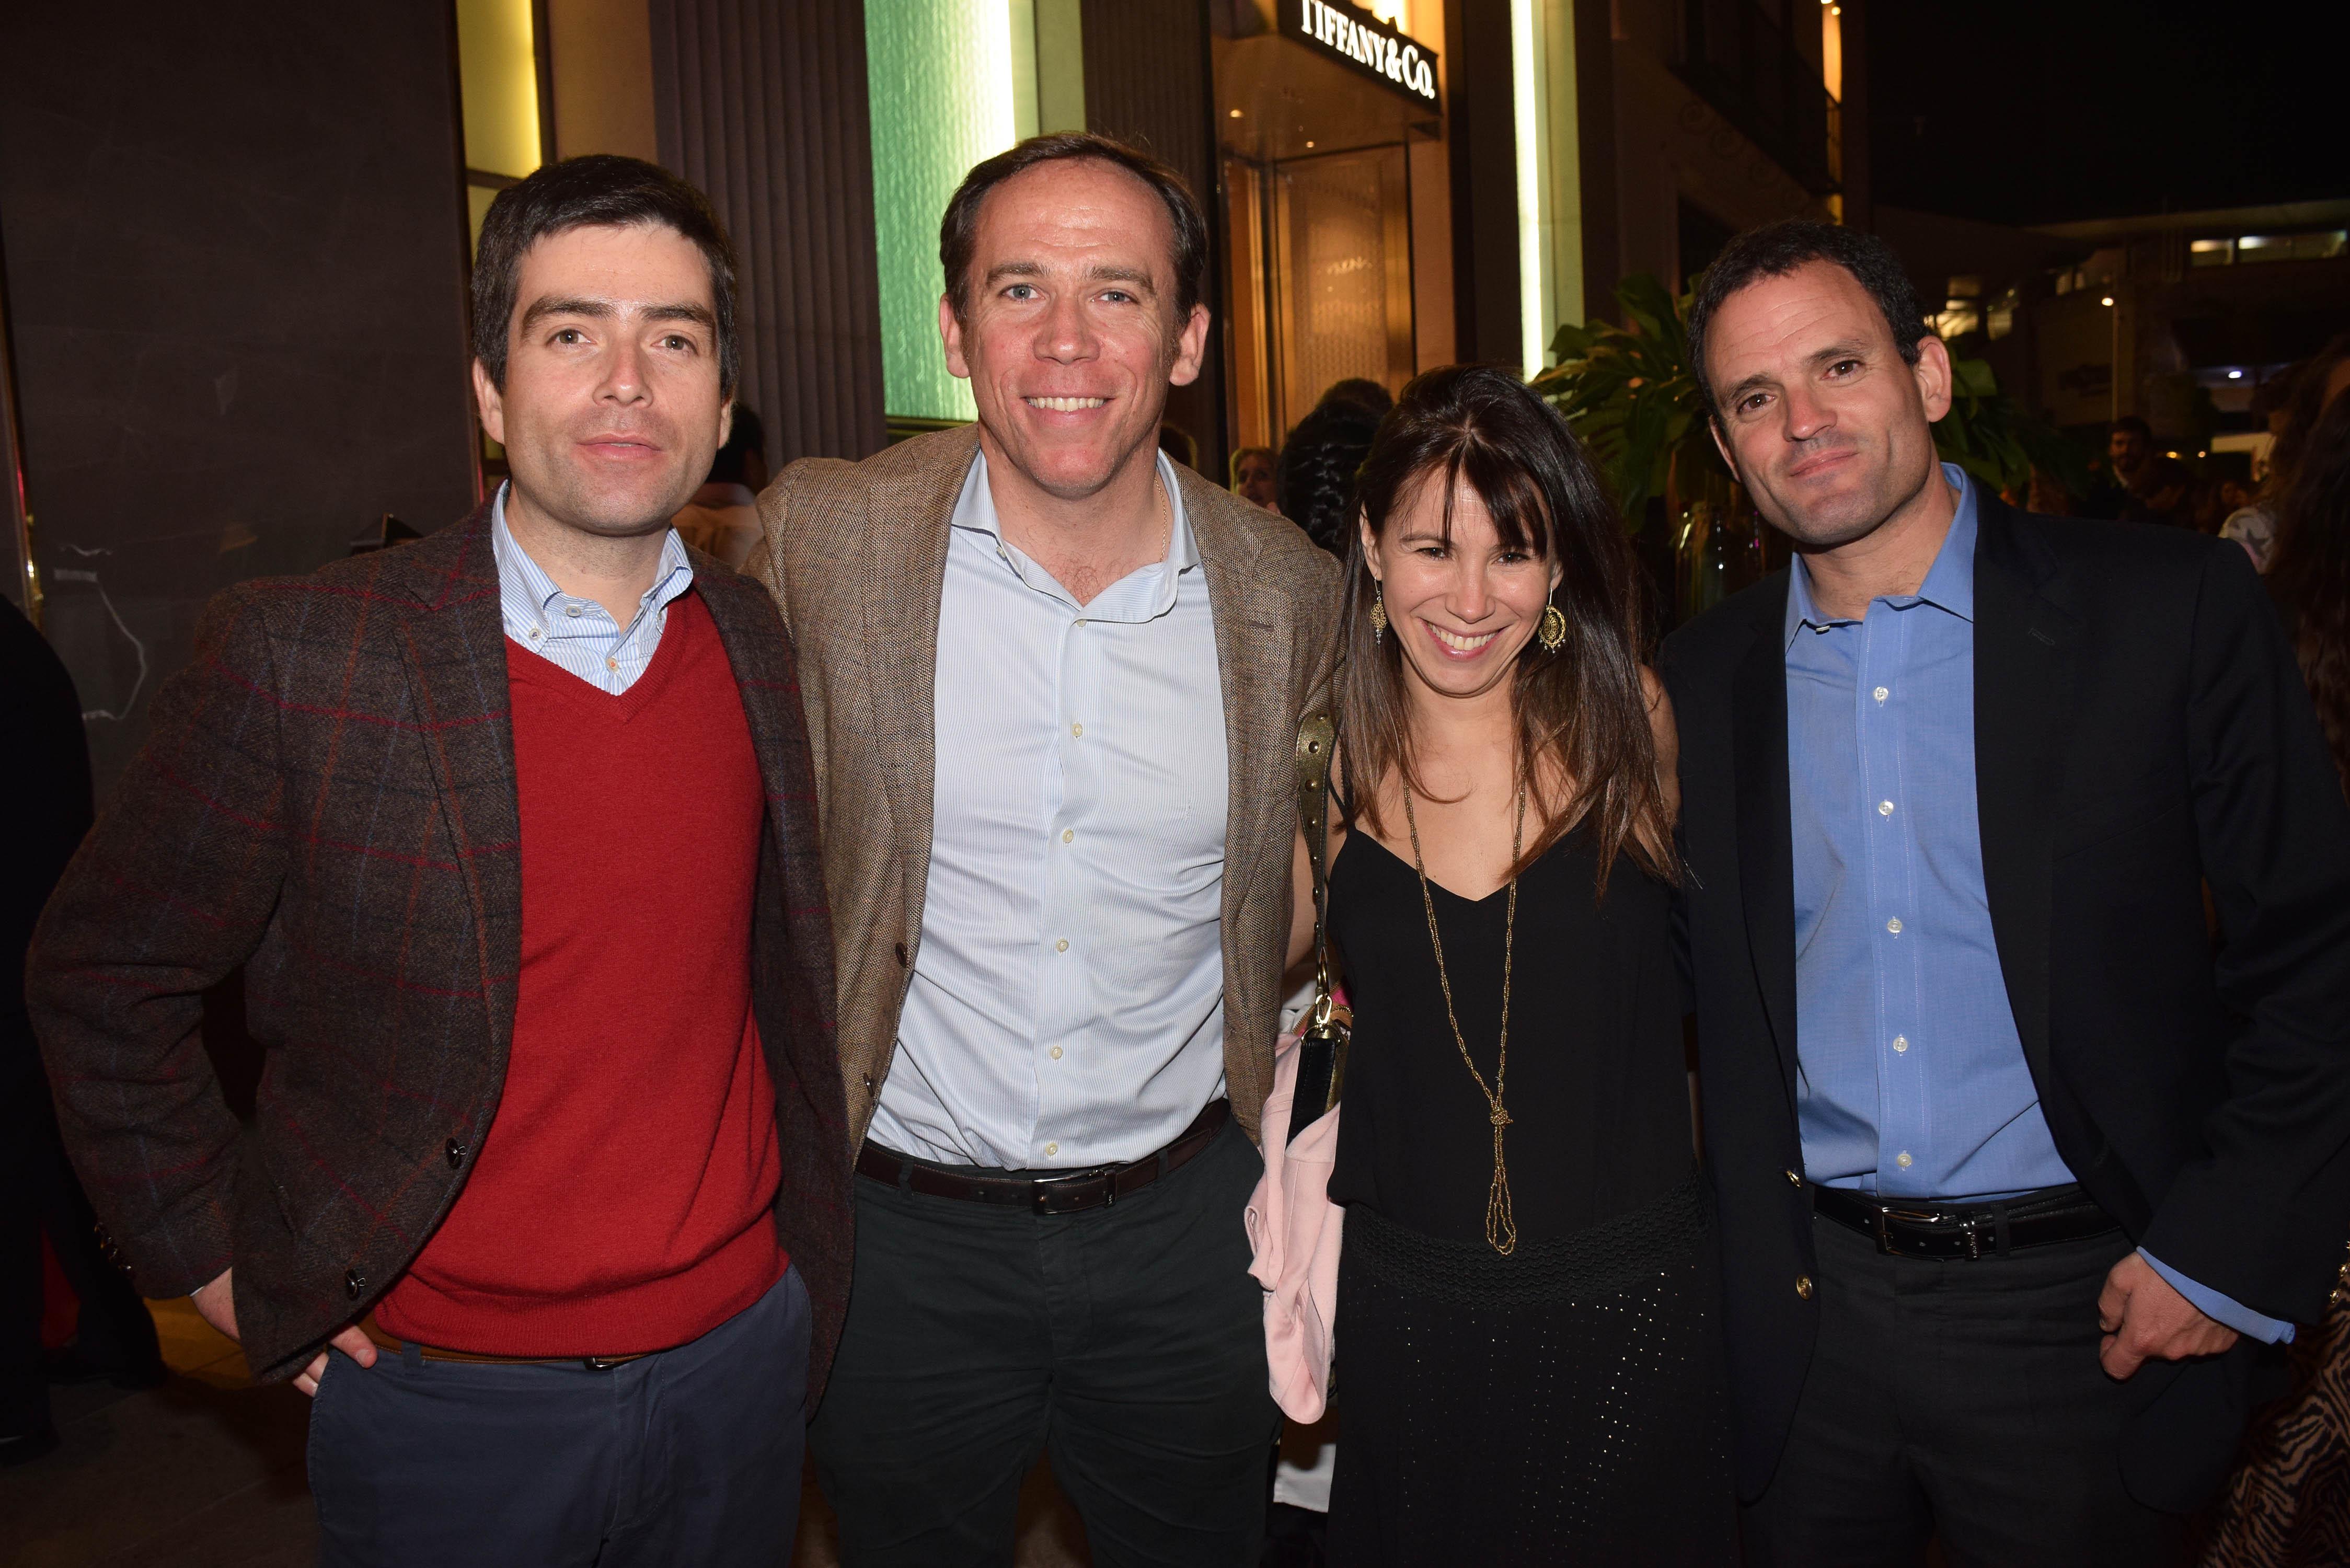 Rodrigo Urzua, Jorge Alessandri, Paula Almarza e Ignacio Garay